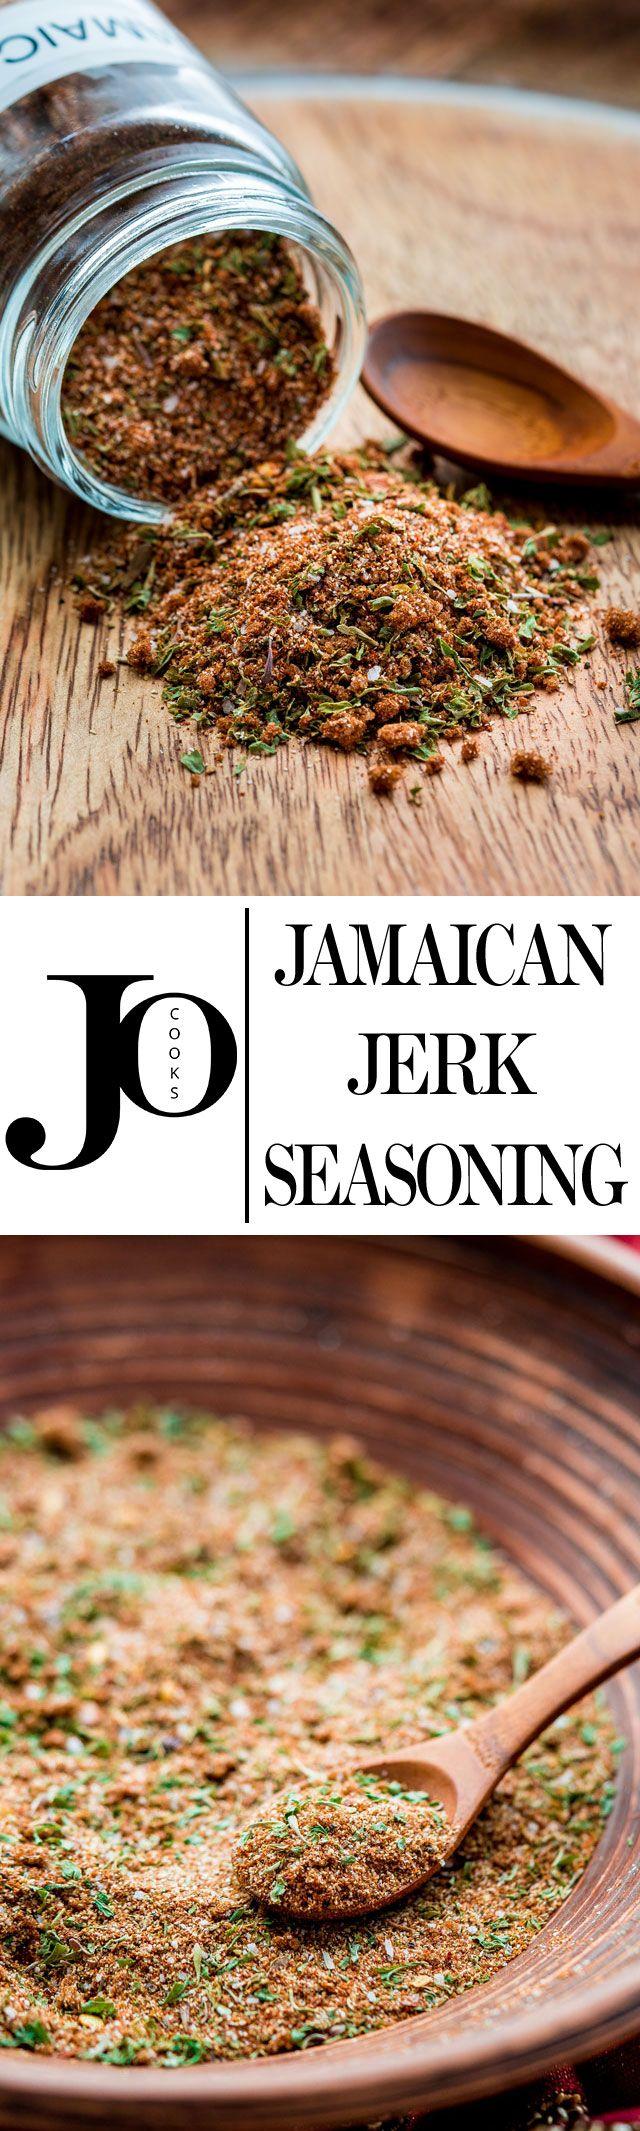 No Bake: Jamaican Jerk Seasoning - Jo Cooks